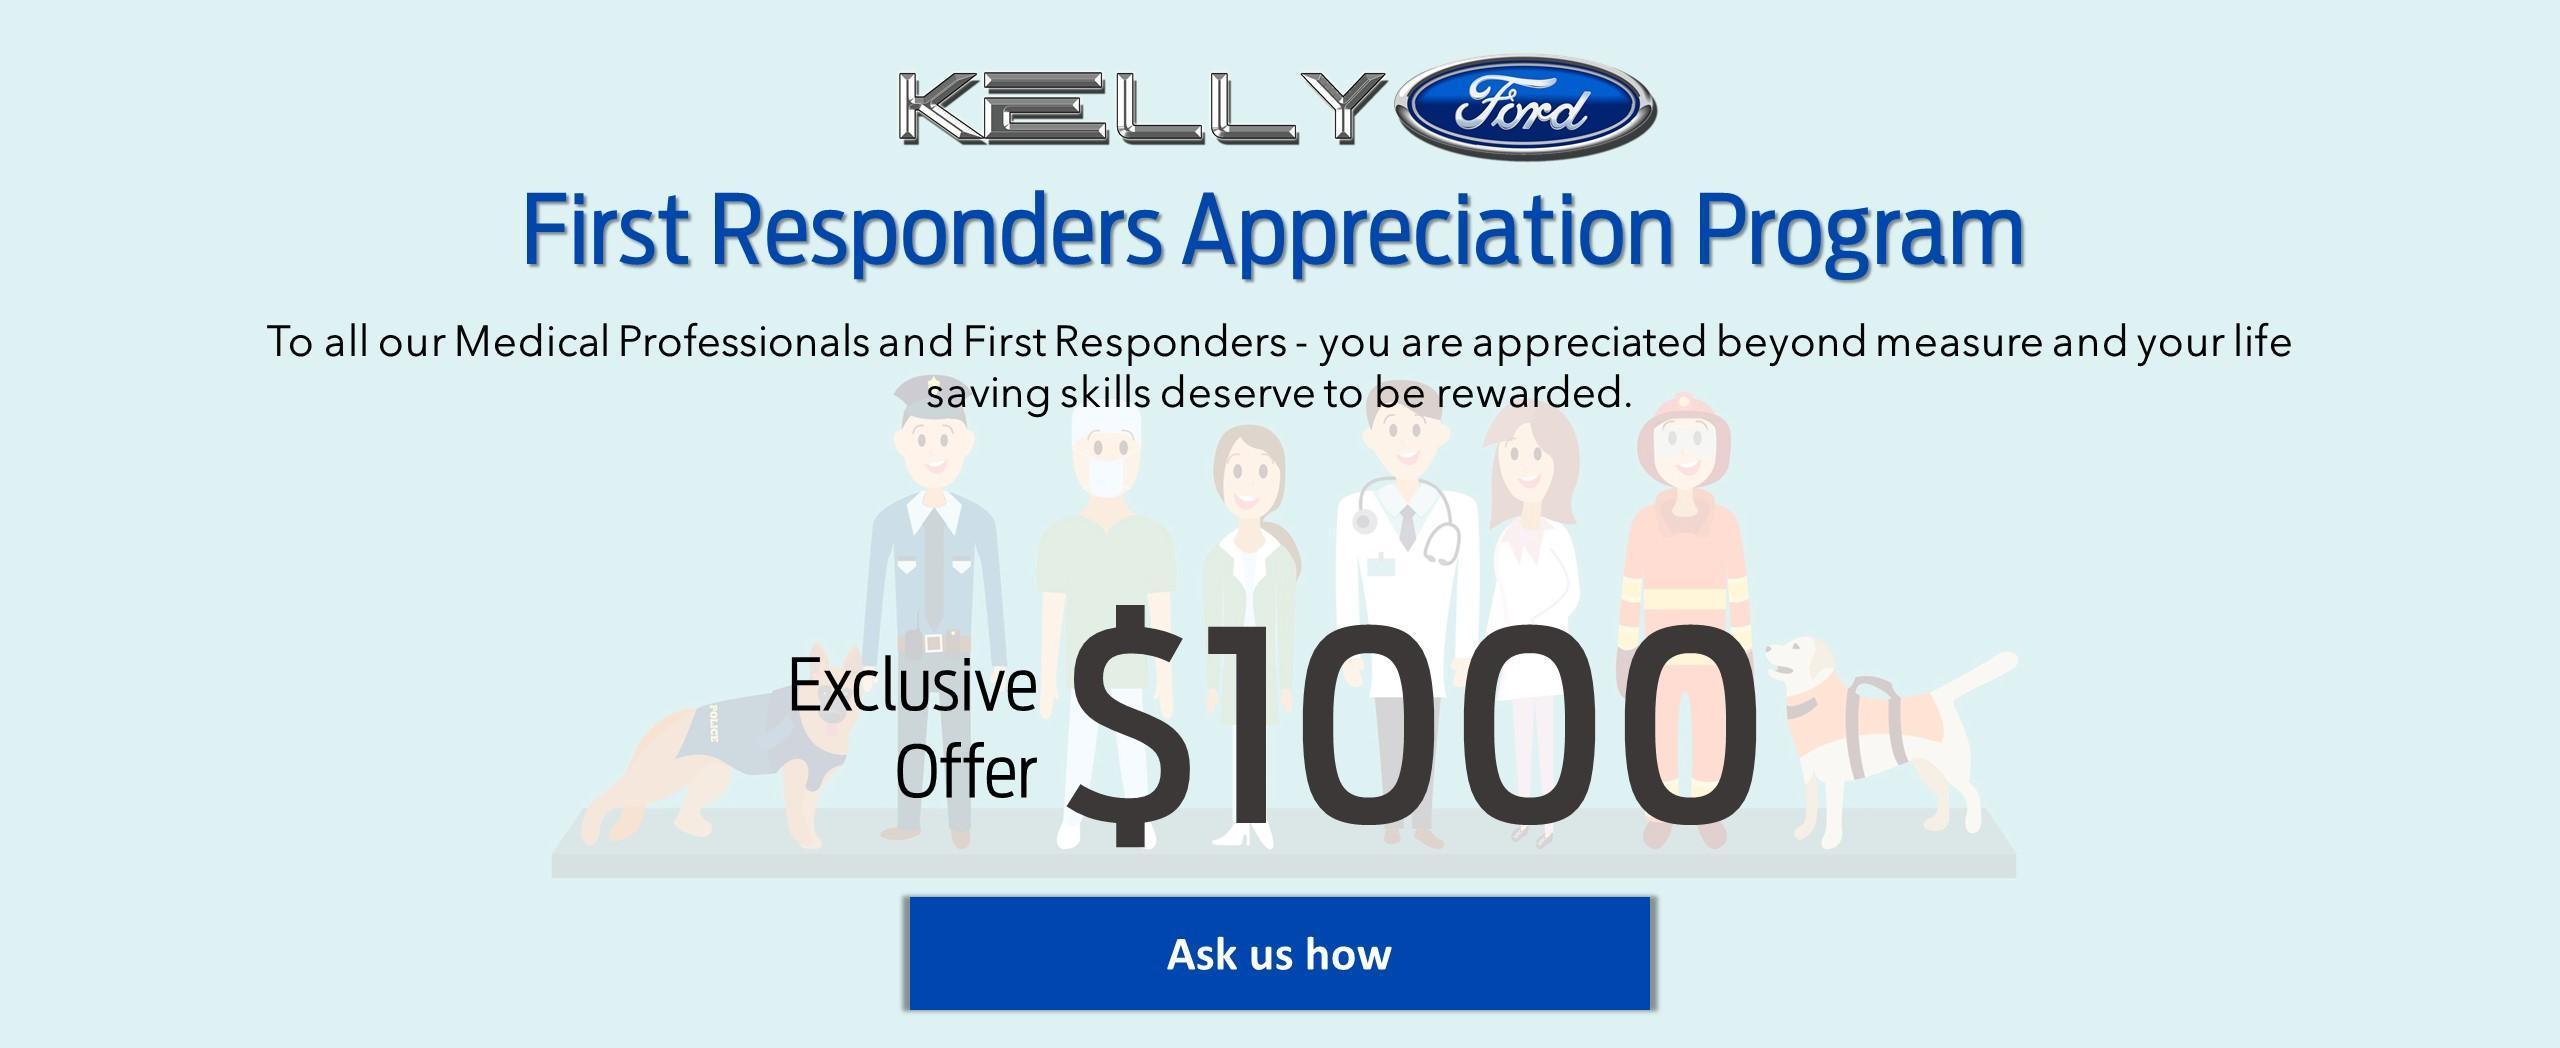 First Responders Appreciation Program